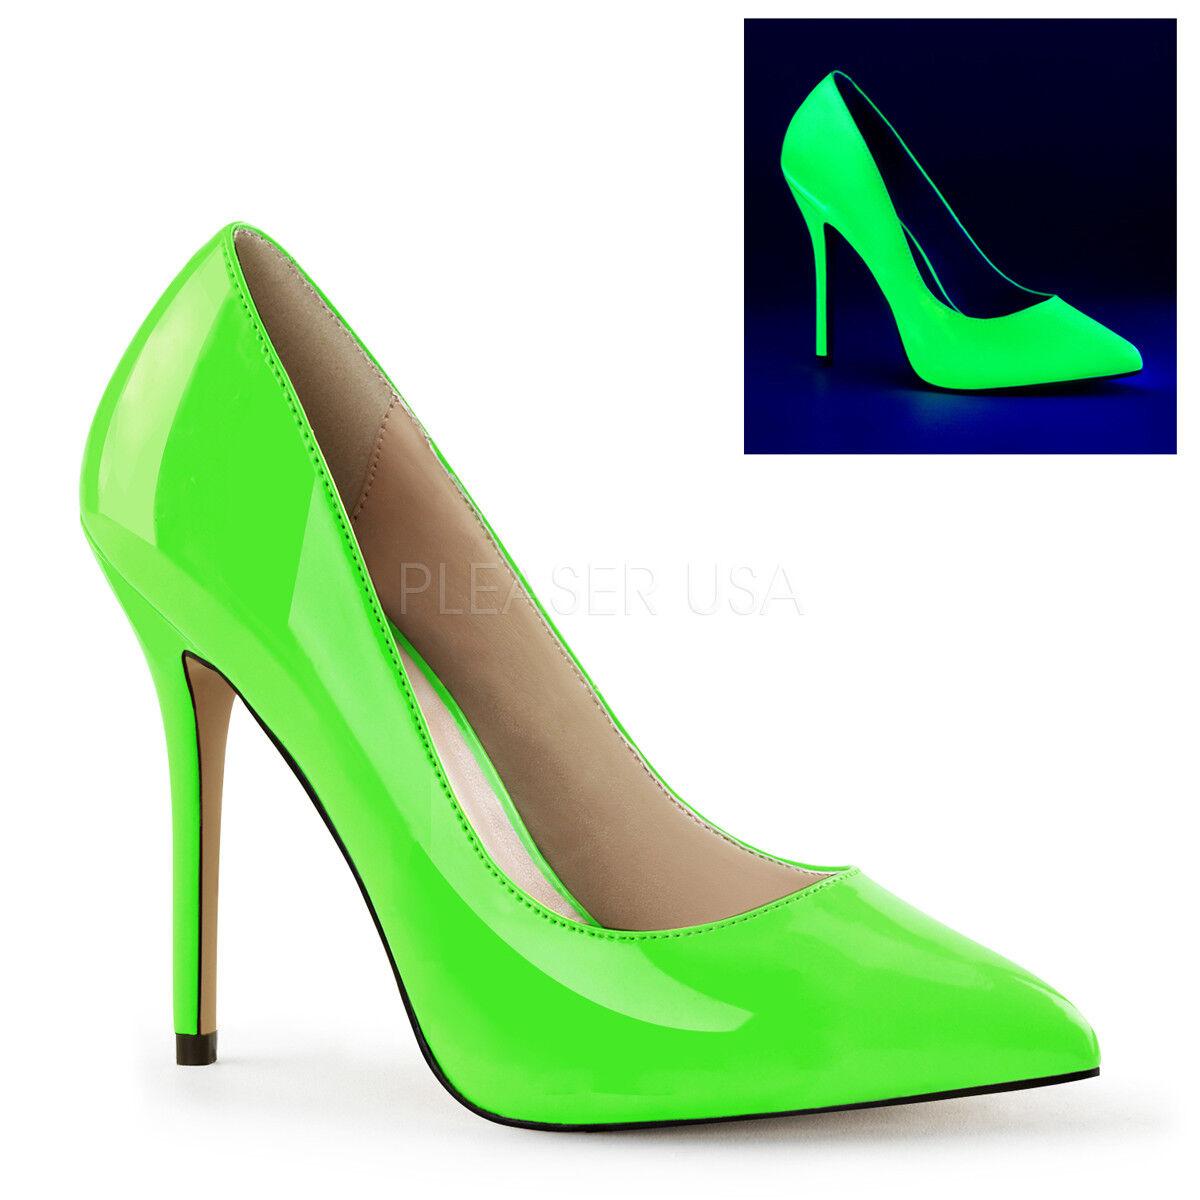 Pleaser AMUSE-20 Neon Grün Hidden Platform Pump Slip On Close Toe High Heels